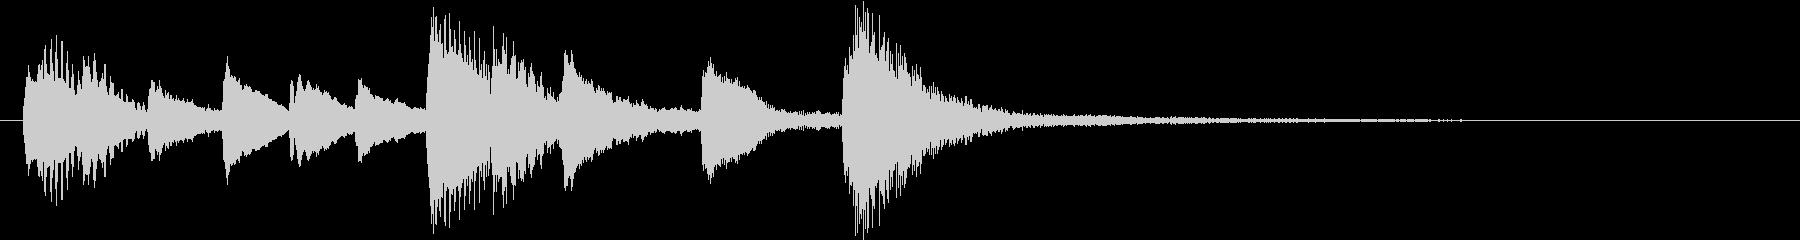 CMや映像に 繊細なシンプルピアノの未再生の波形